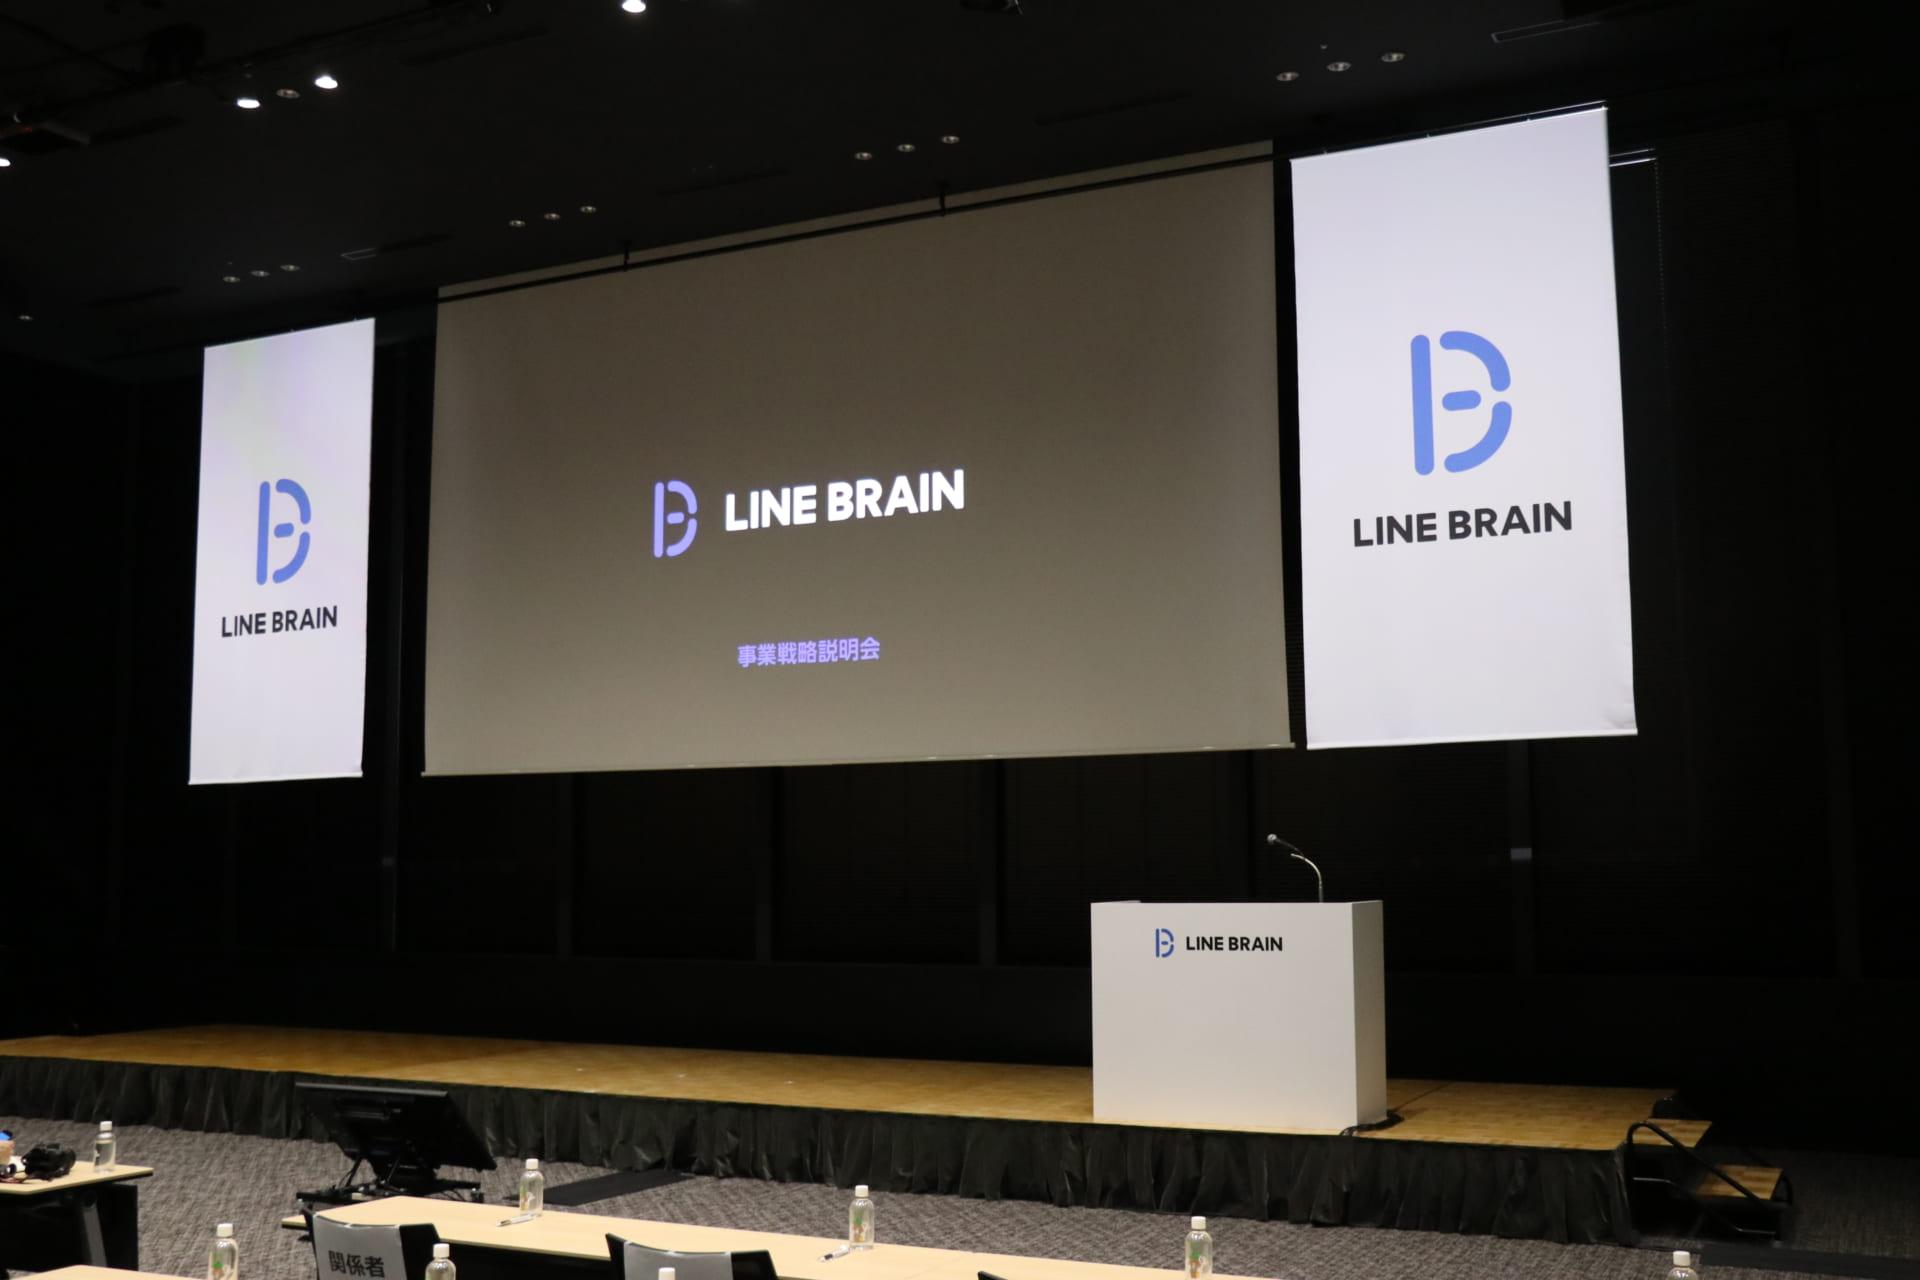 LINEが「LINE BRAIN」の事業戦略発表会を開始。チャットボットは本日から提供開始。